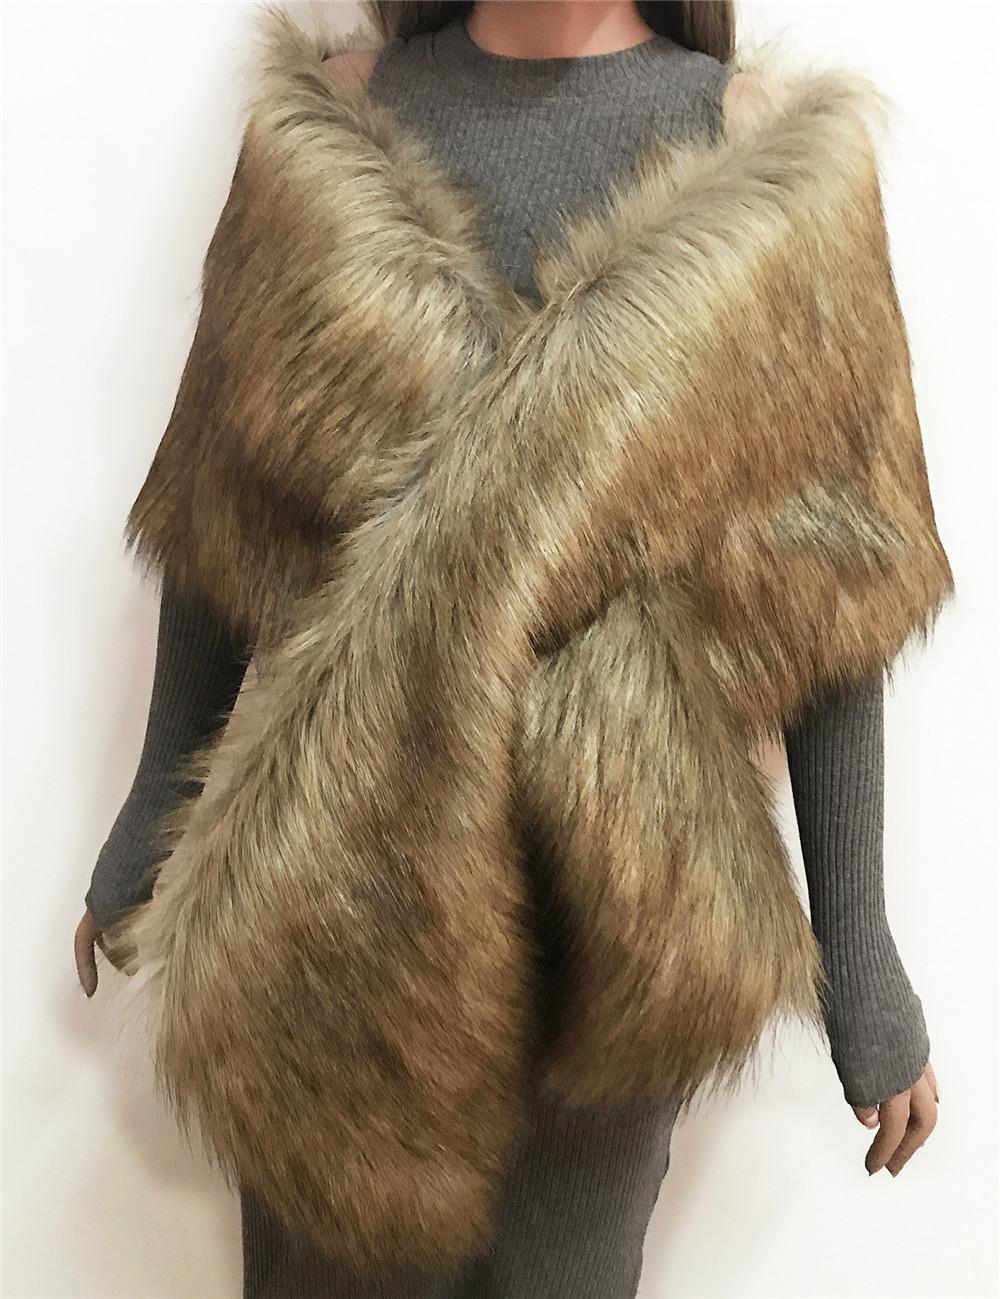 The autumn and winter new imitation fur big cape neck scarf multi-color joker scarf bride dress cross cape (4)